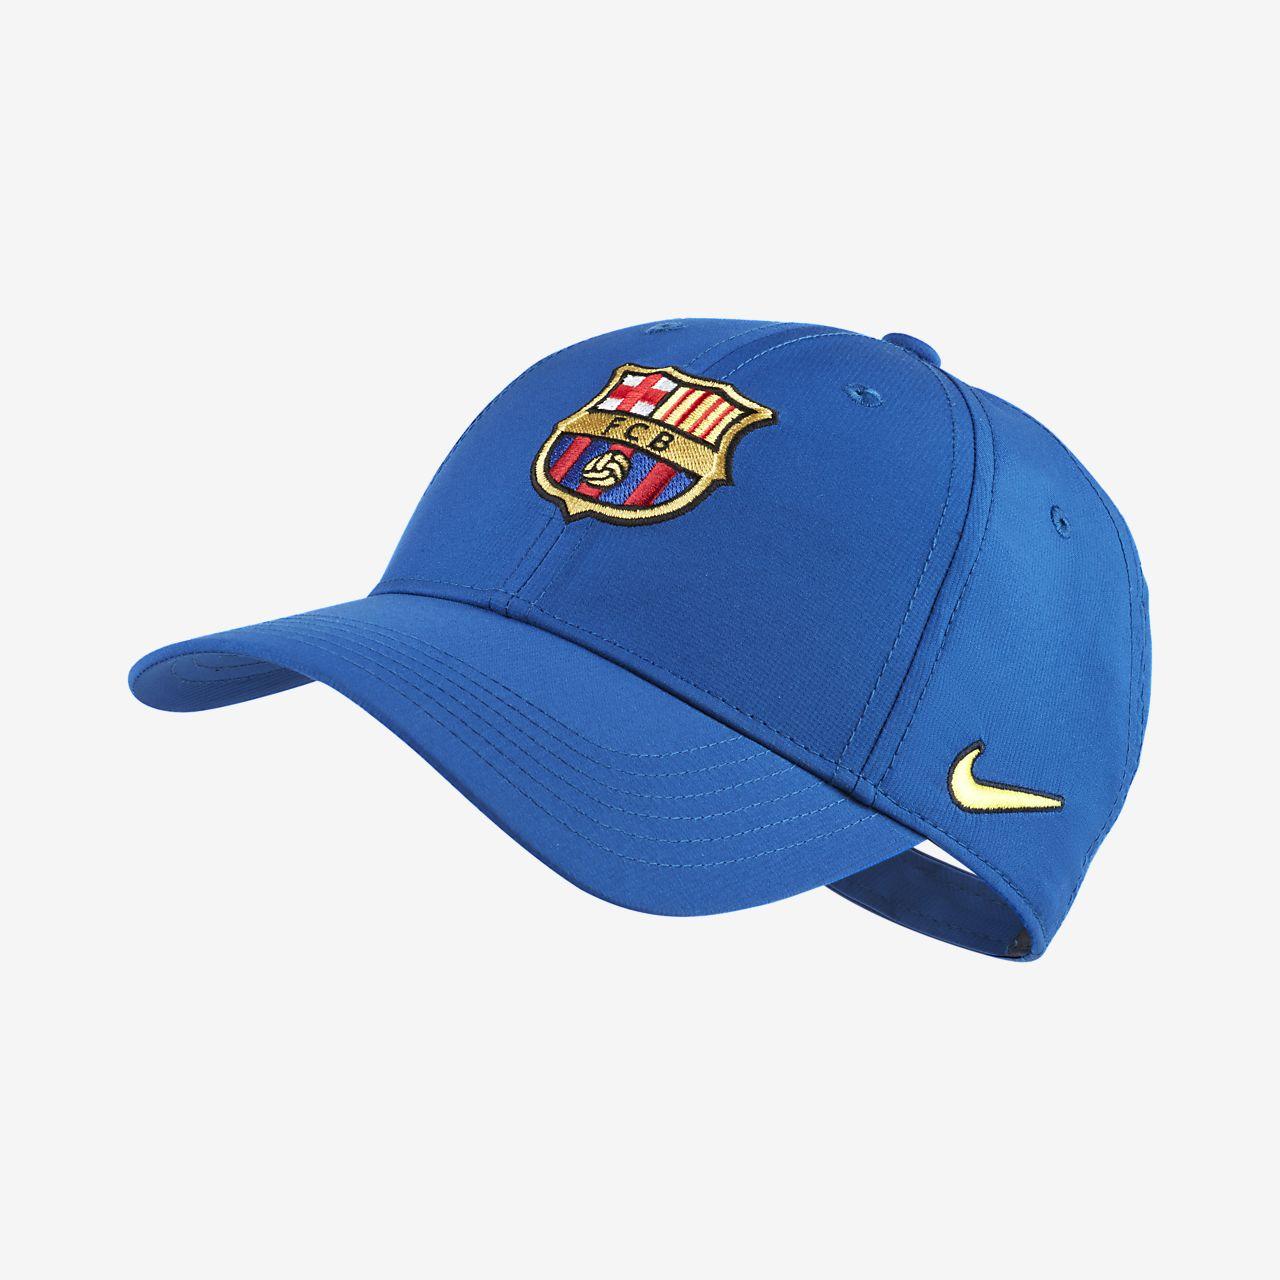 7a1cd5e3e43c85 Nike Dri-FIT FC Barcelona Older Kids' Adjustable Hat. Nike.com SE